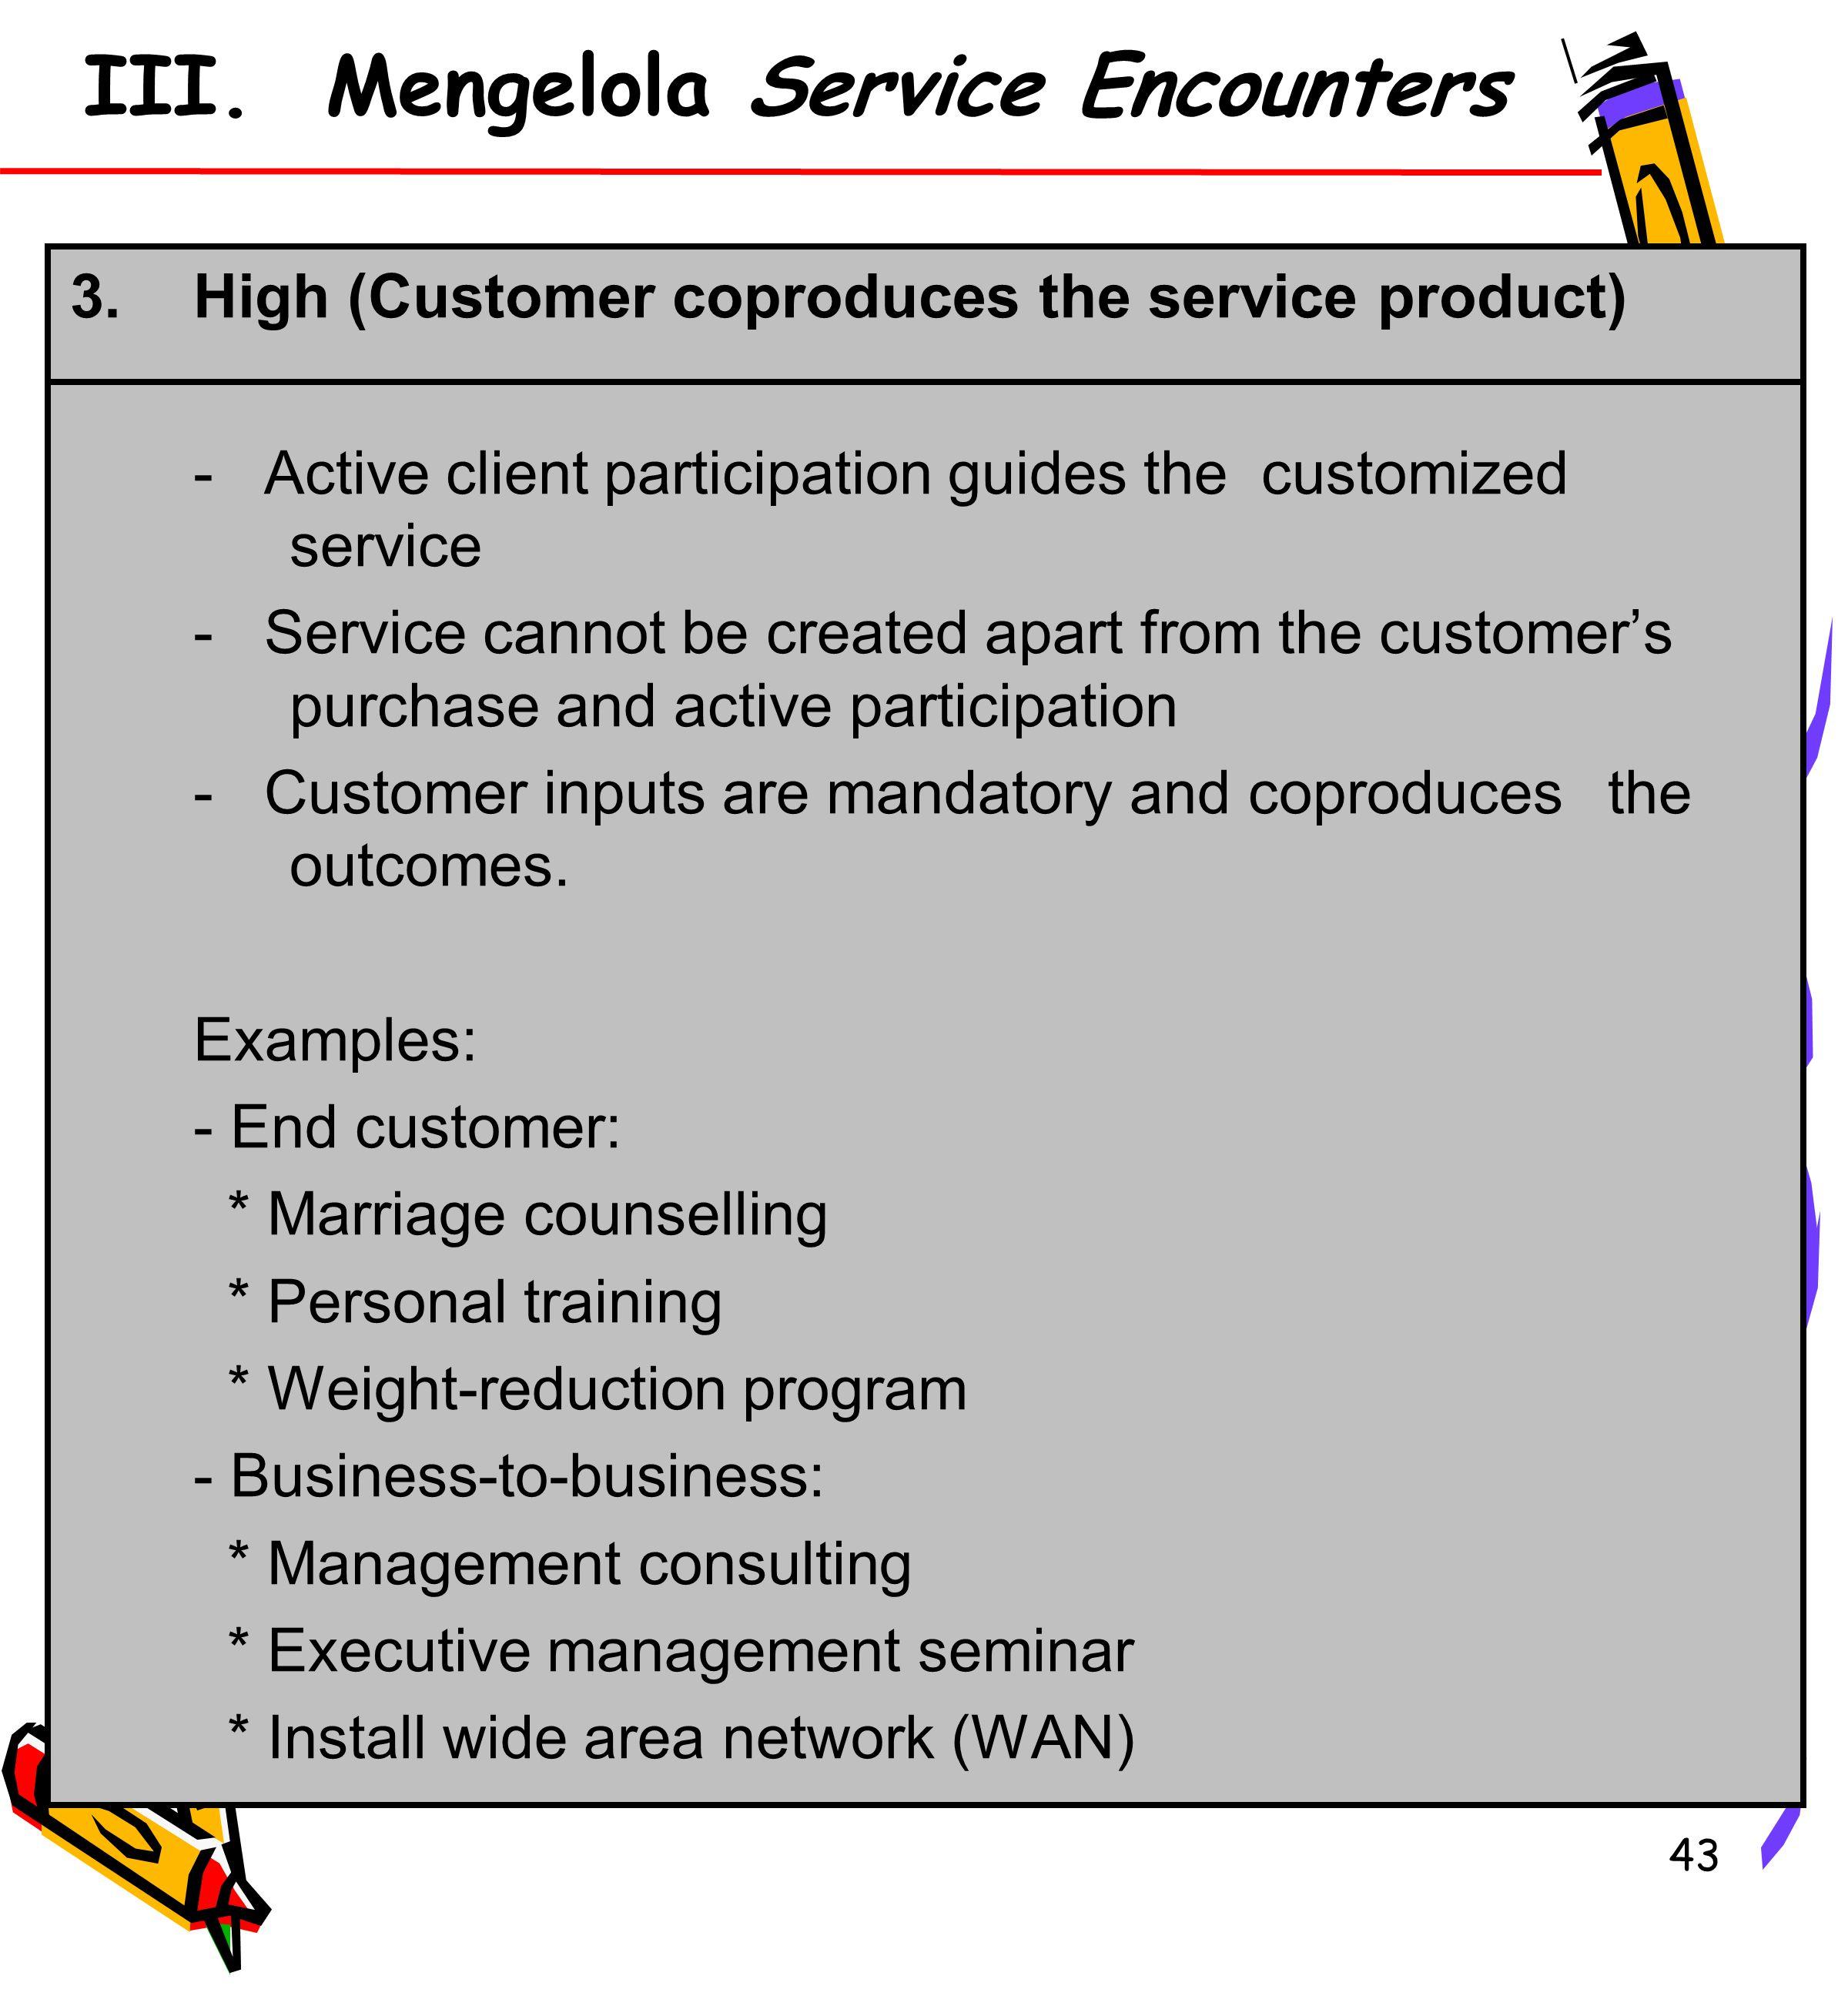 III. Mengelola Service Encounters